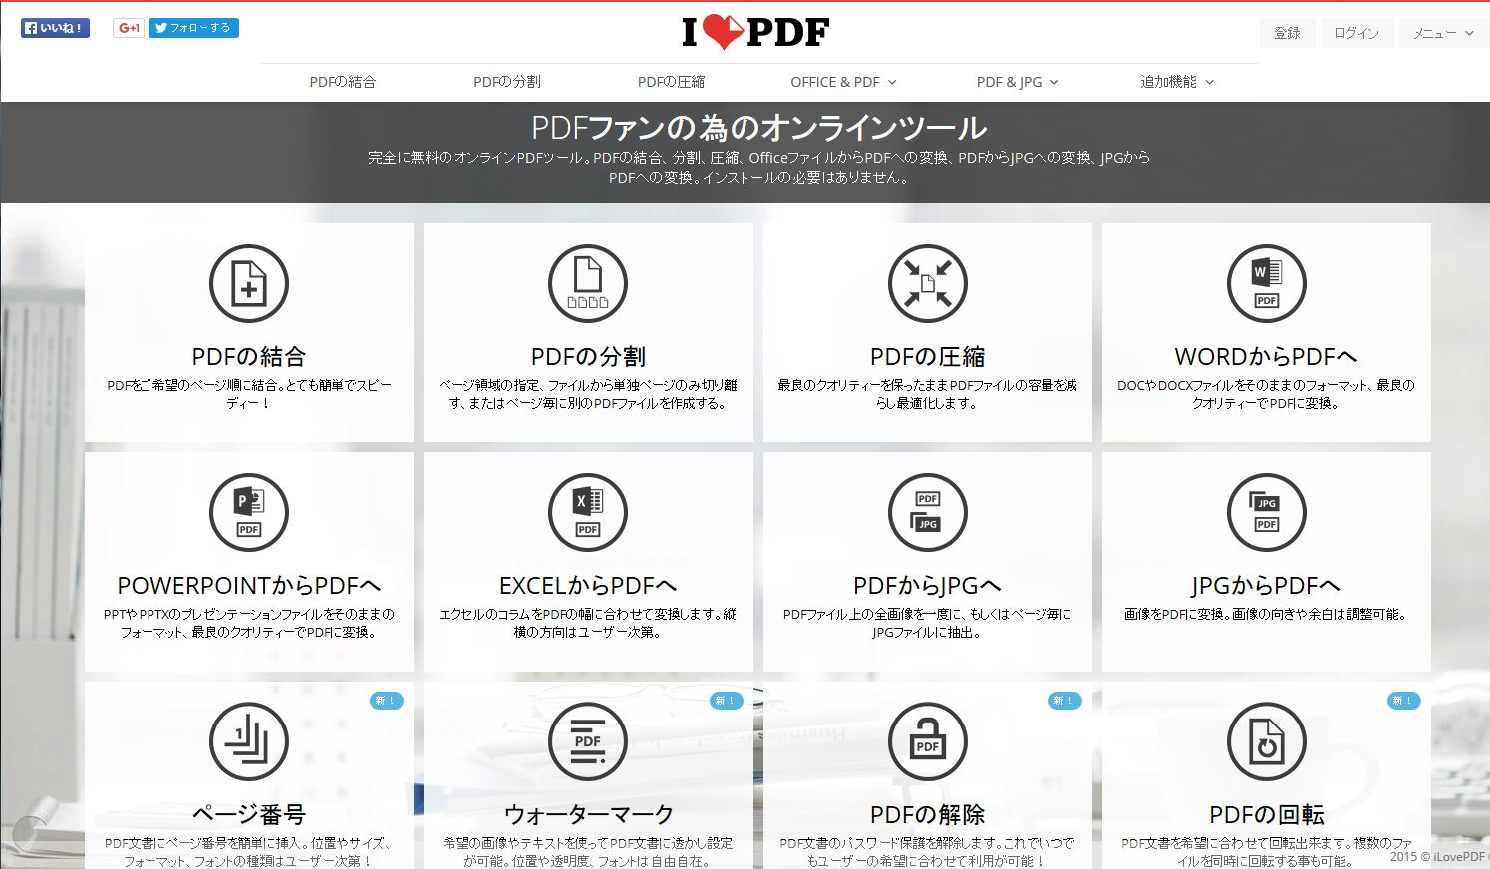 PDF_lovers_001